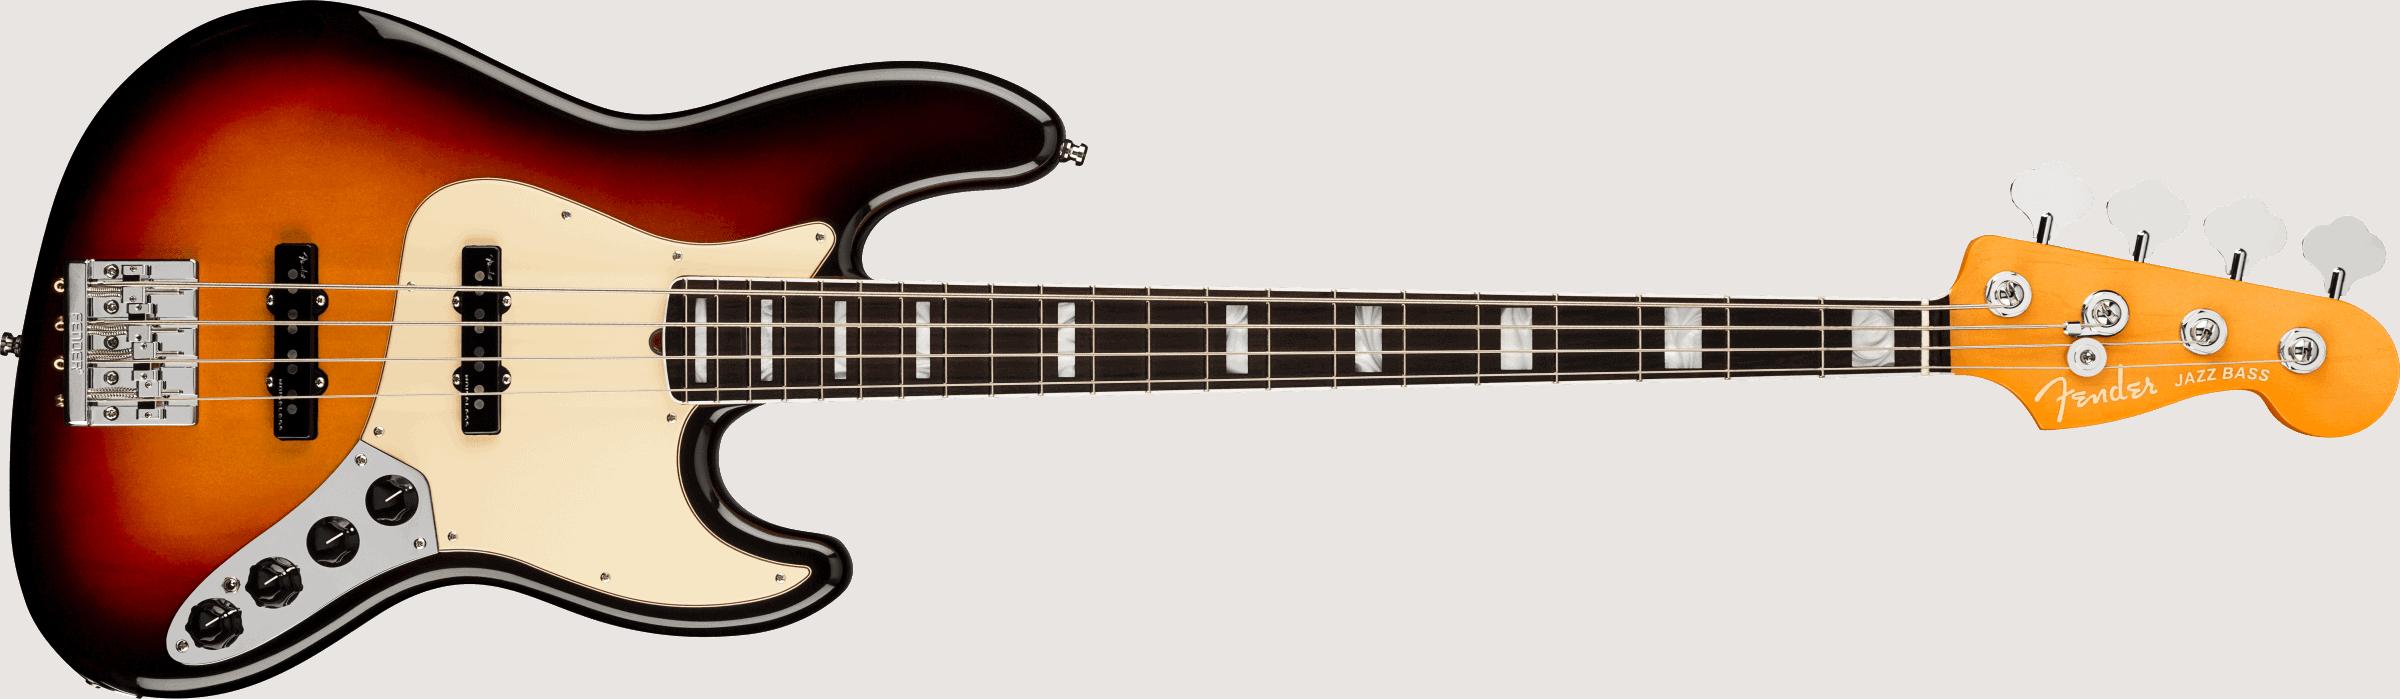 Fender American Ultra Jazz Bass®, Rosewood Fingerboard, Ultraburst